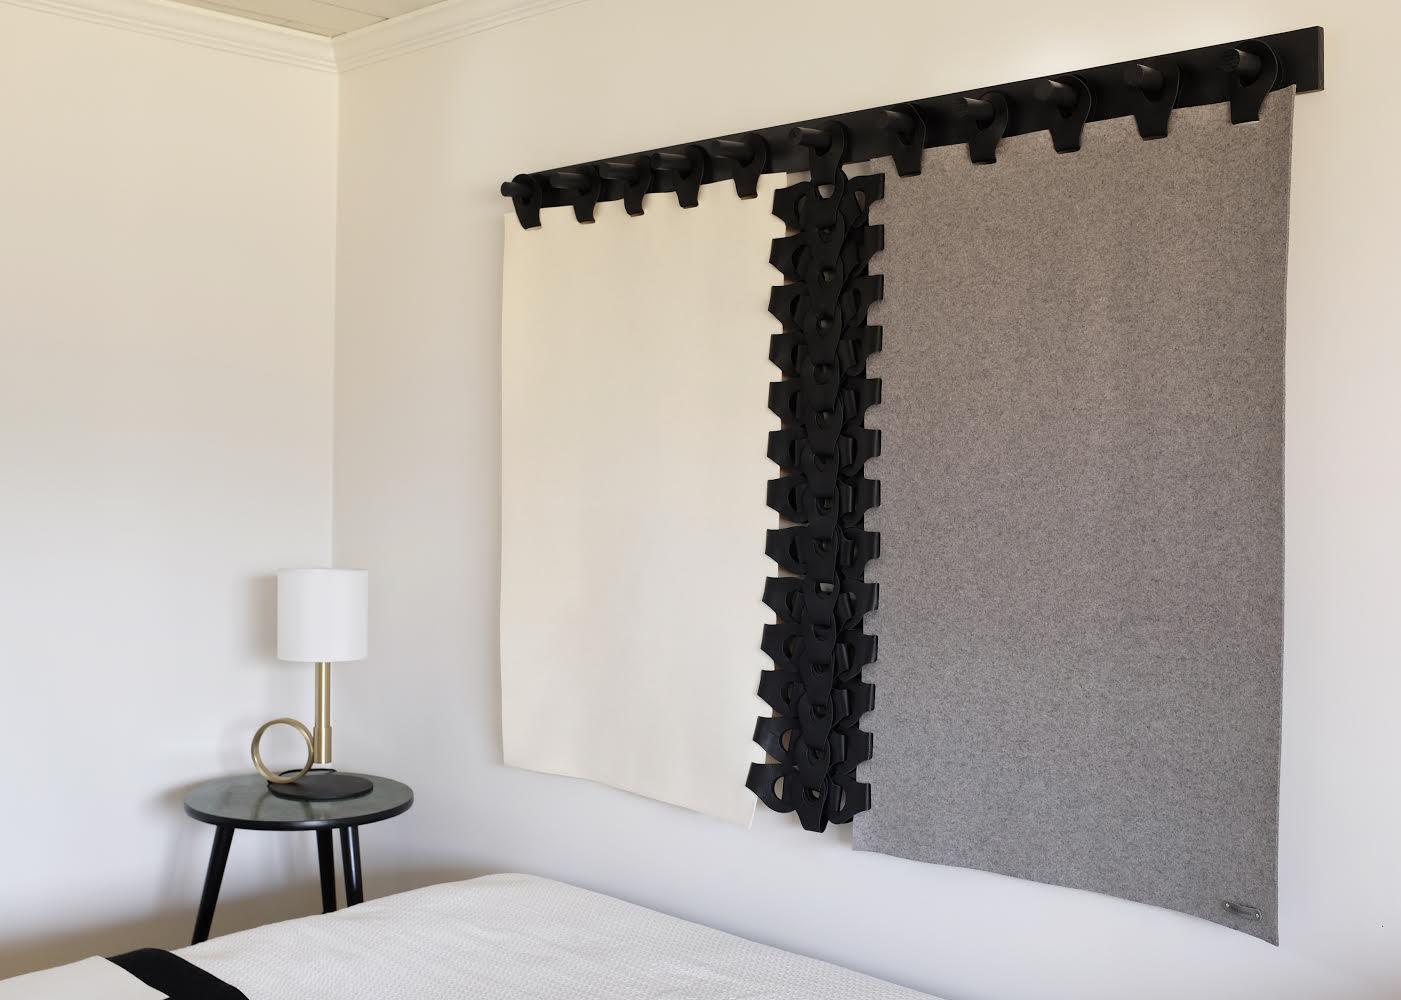 Vertebrae Tapestry  In Shades : Megan Pflug Interior Design - The Woodhouse Lodge